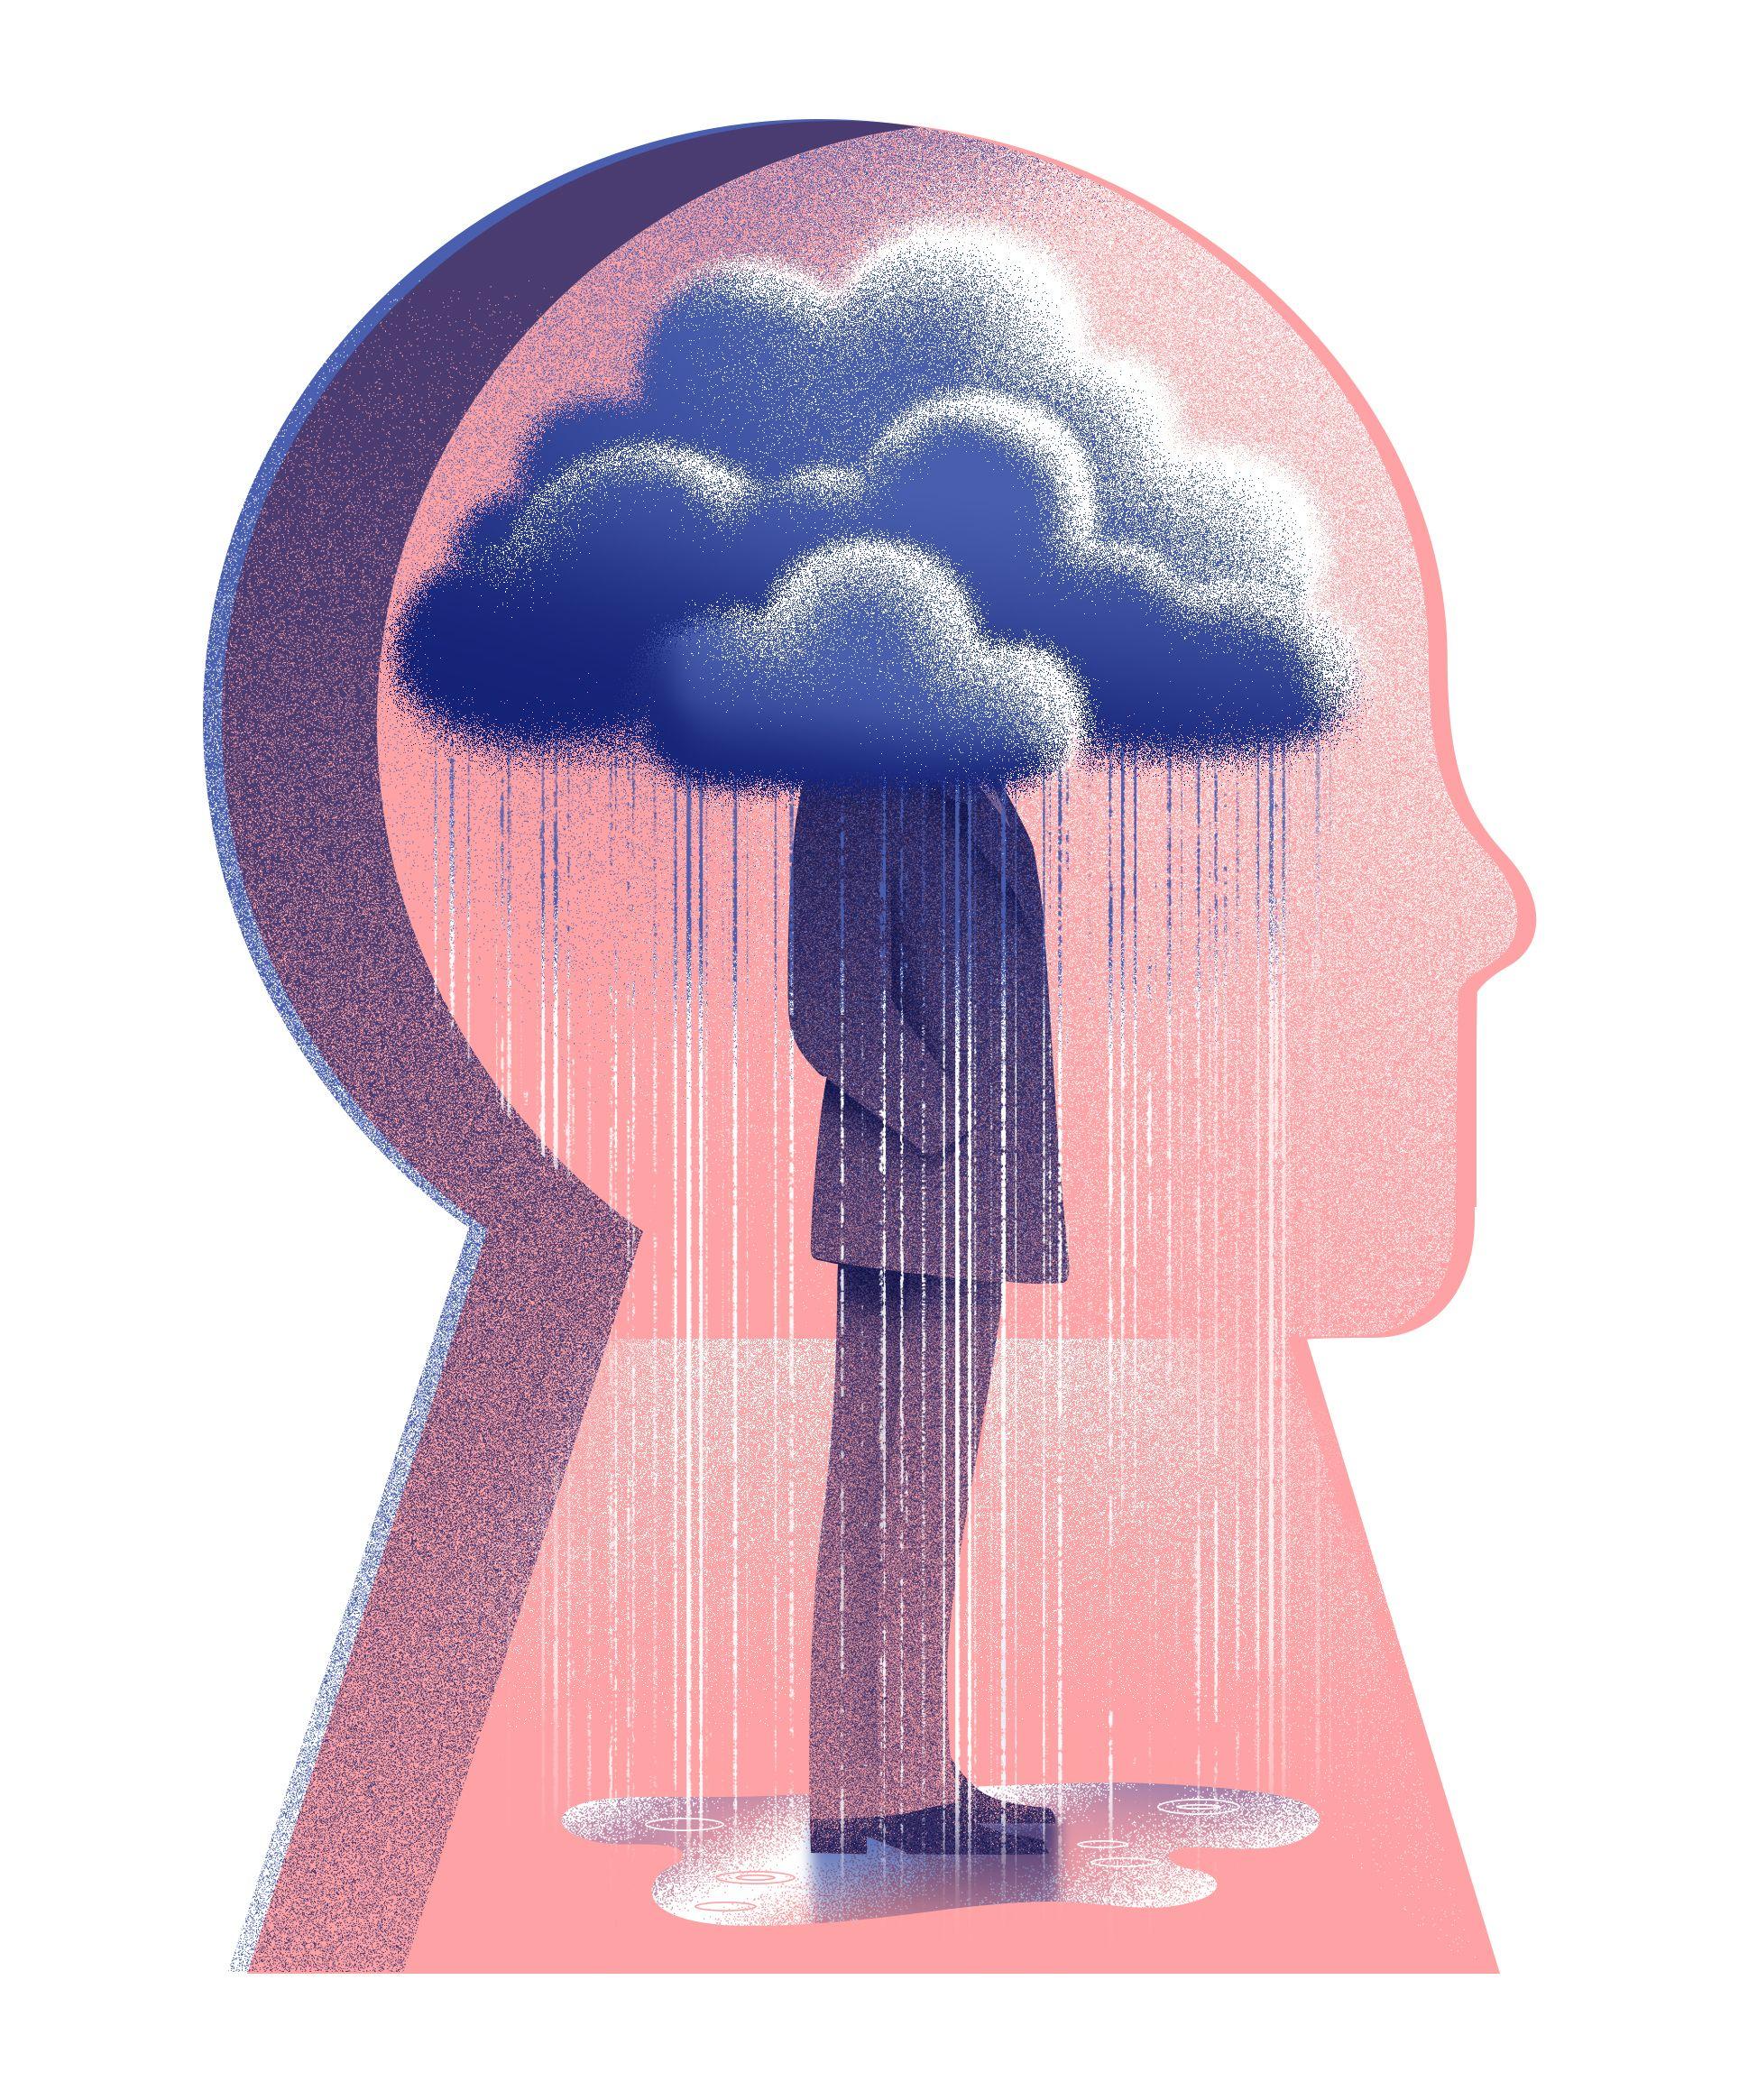 Amazing art from Mental Health Awareness Week